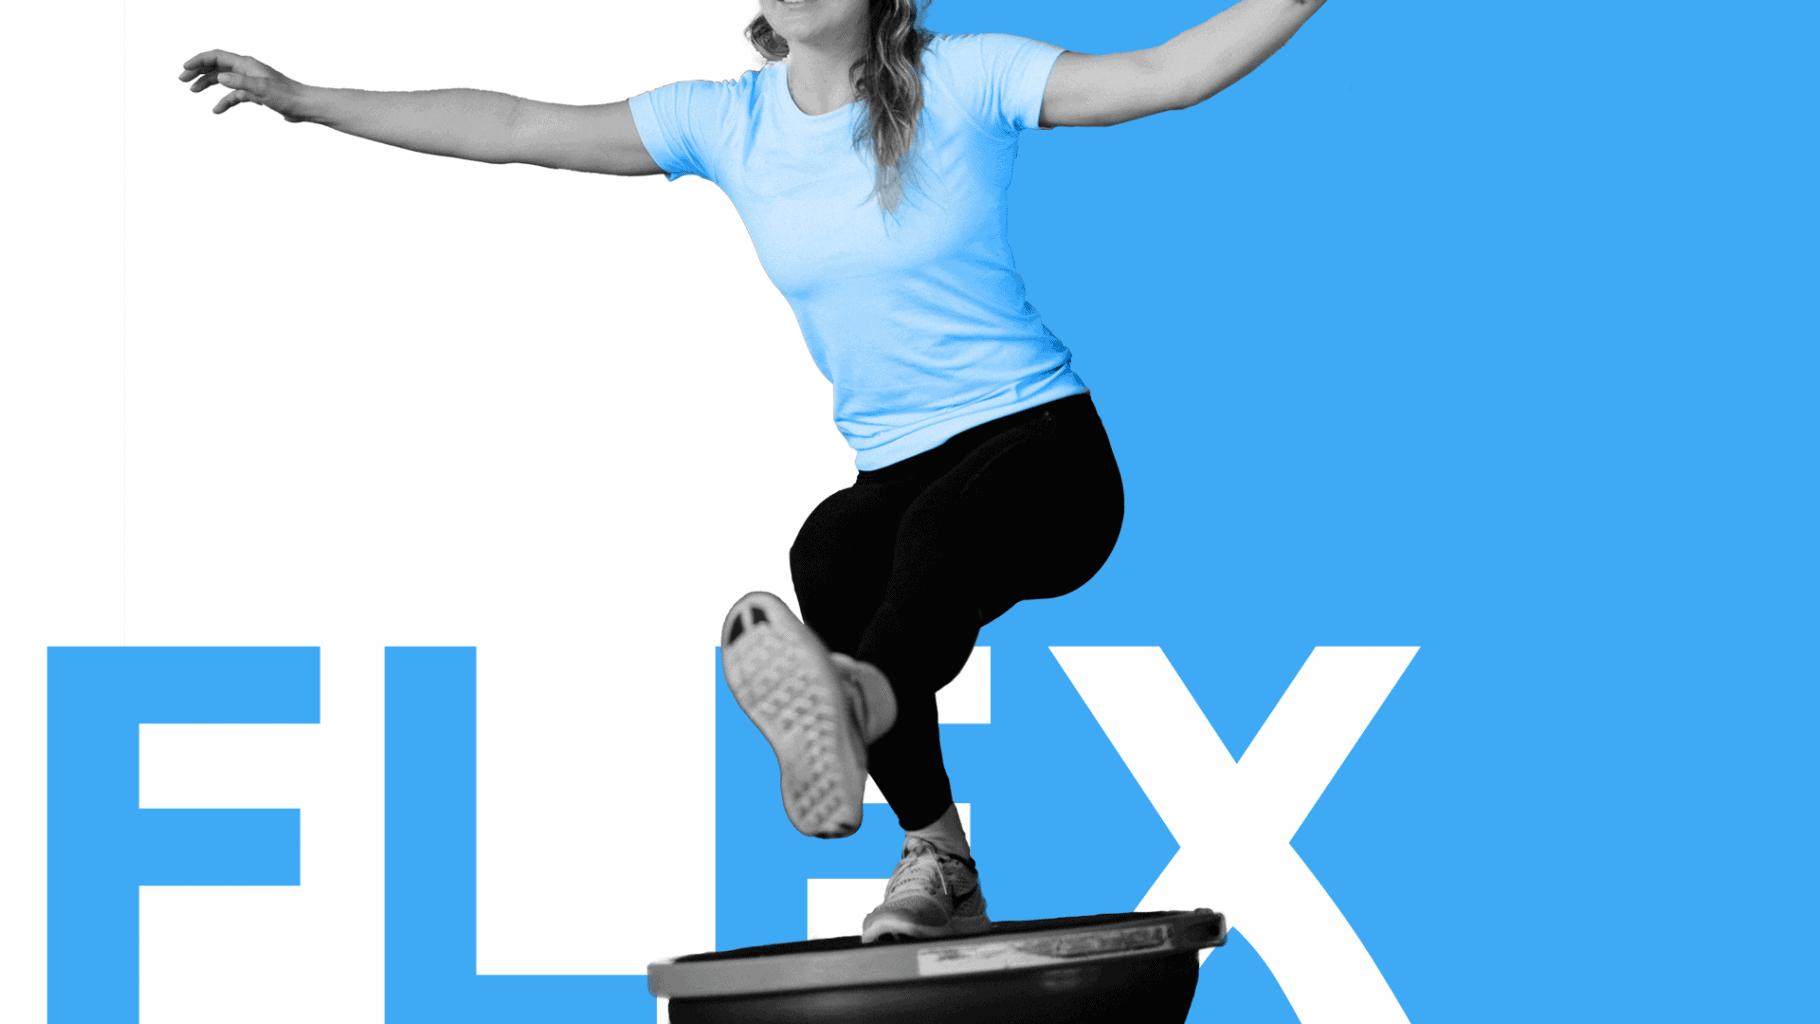 Bi PHiT PT FLEX